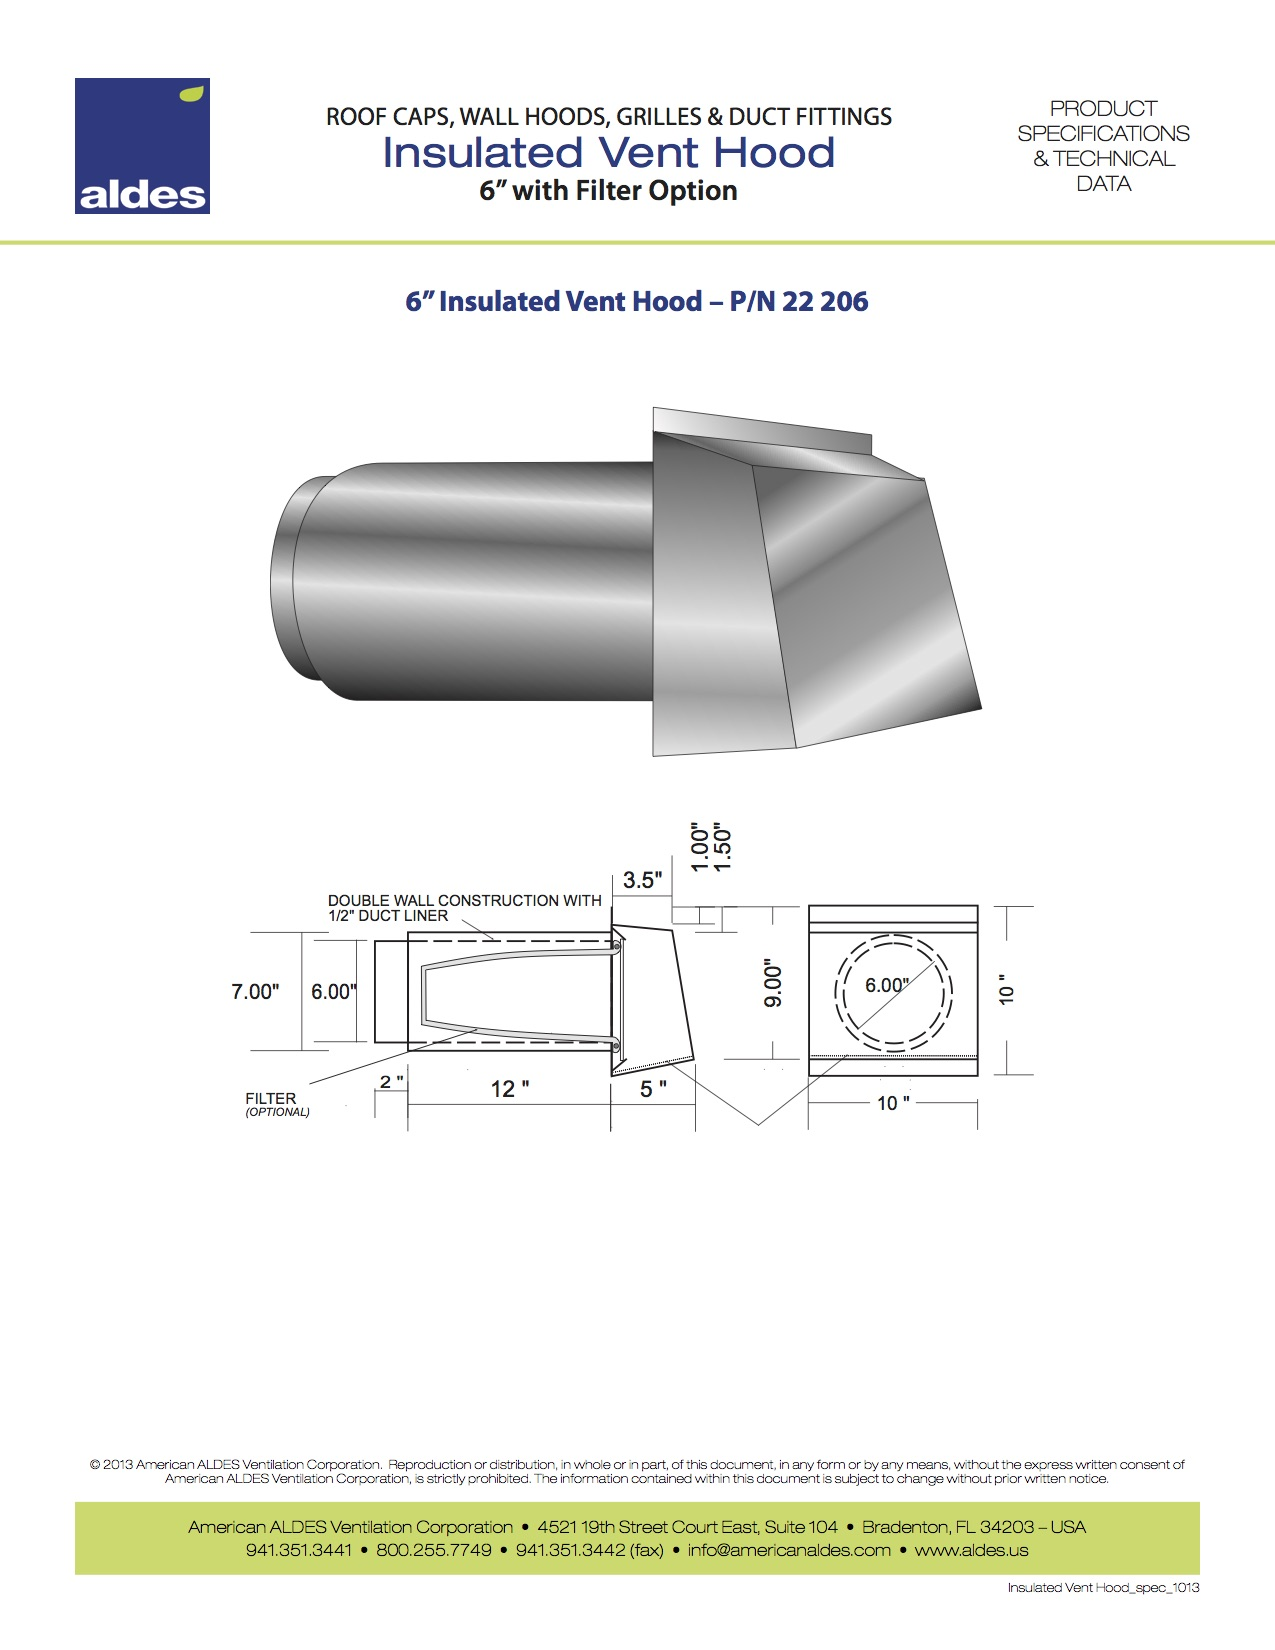 Insulated Vent Hood American Aldes Ventilation Corporation